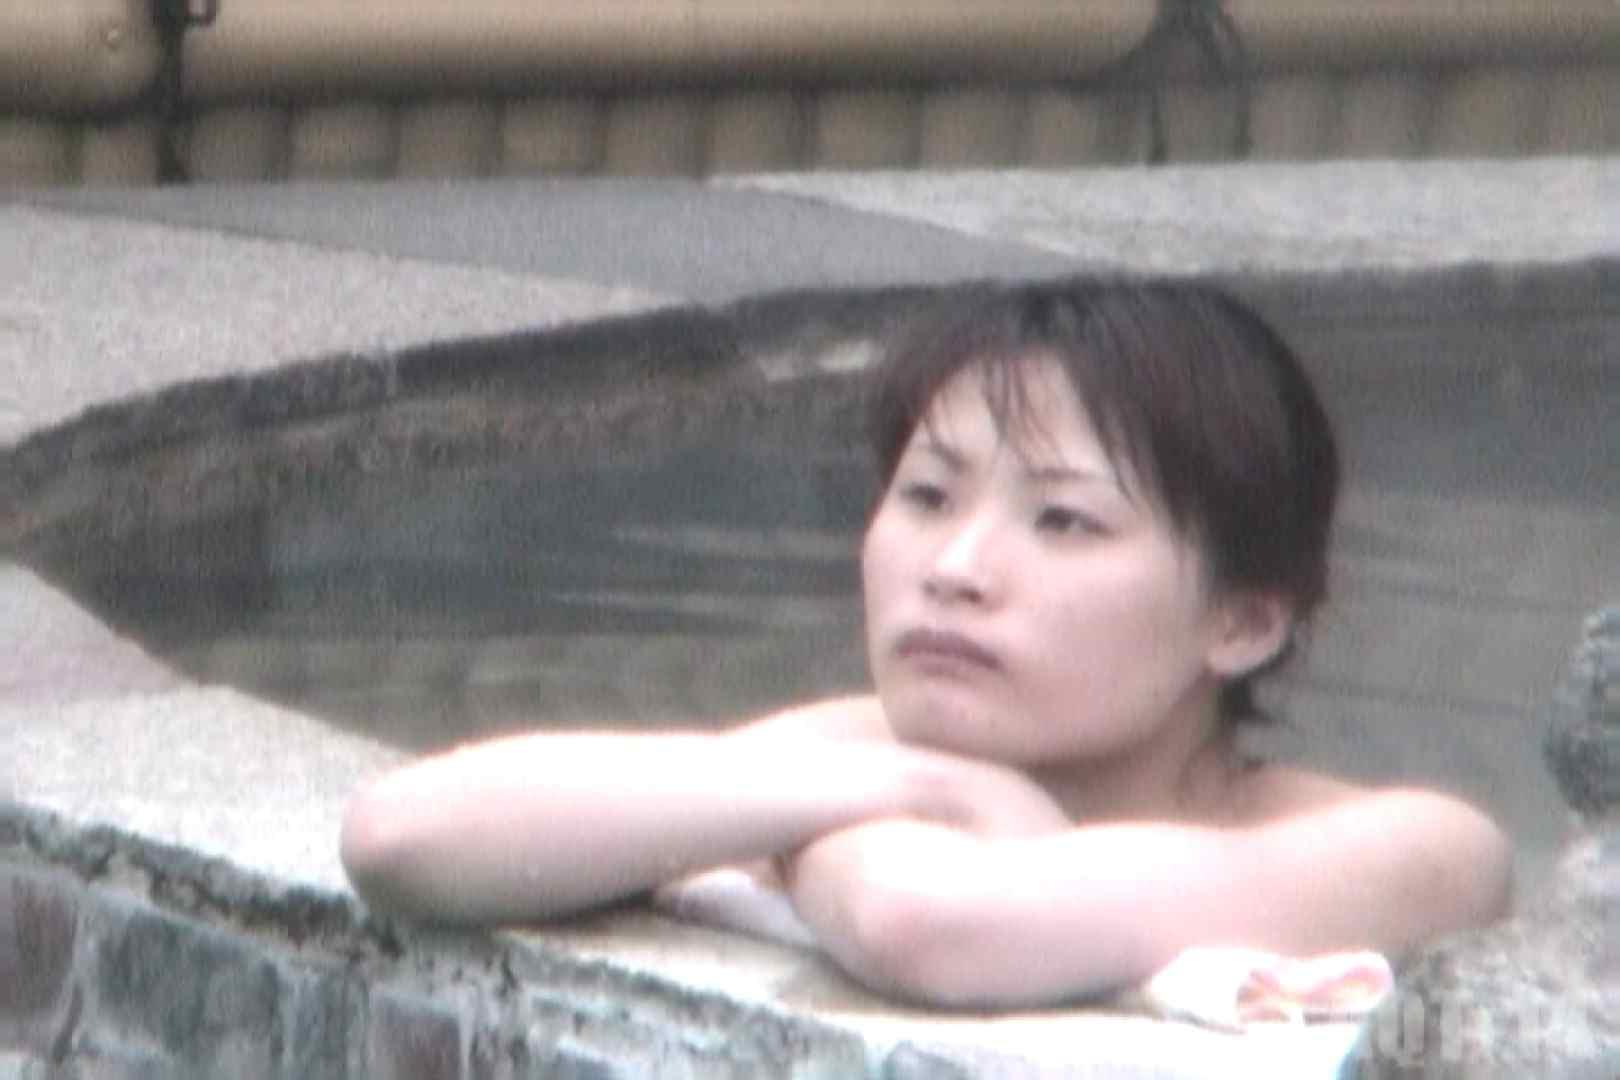 Aquaな露天風呂Vol.822 盗撮師作品 SEX無修正画像 75pic 23